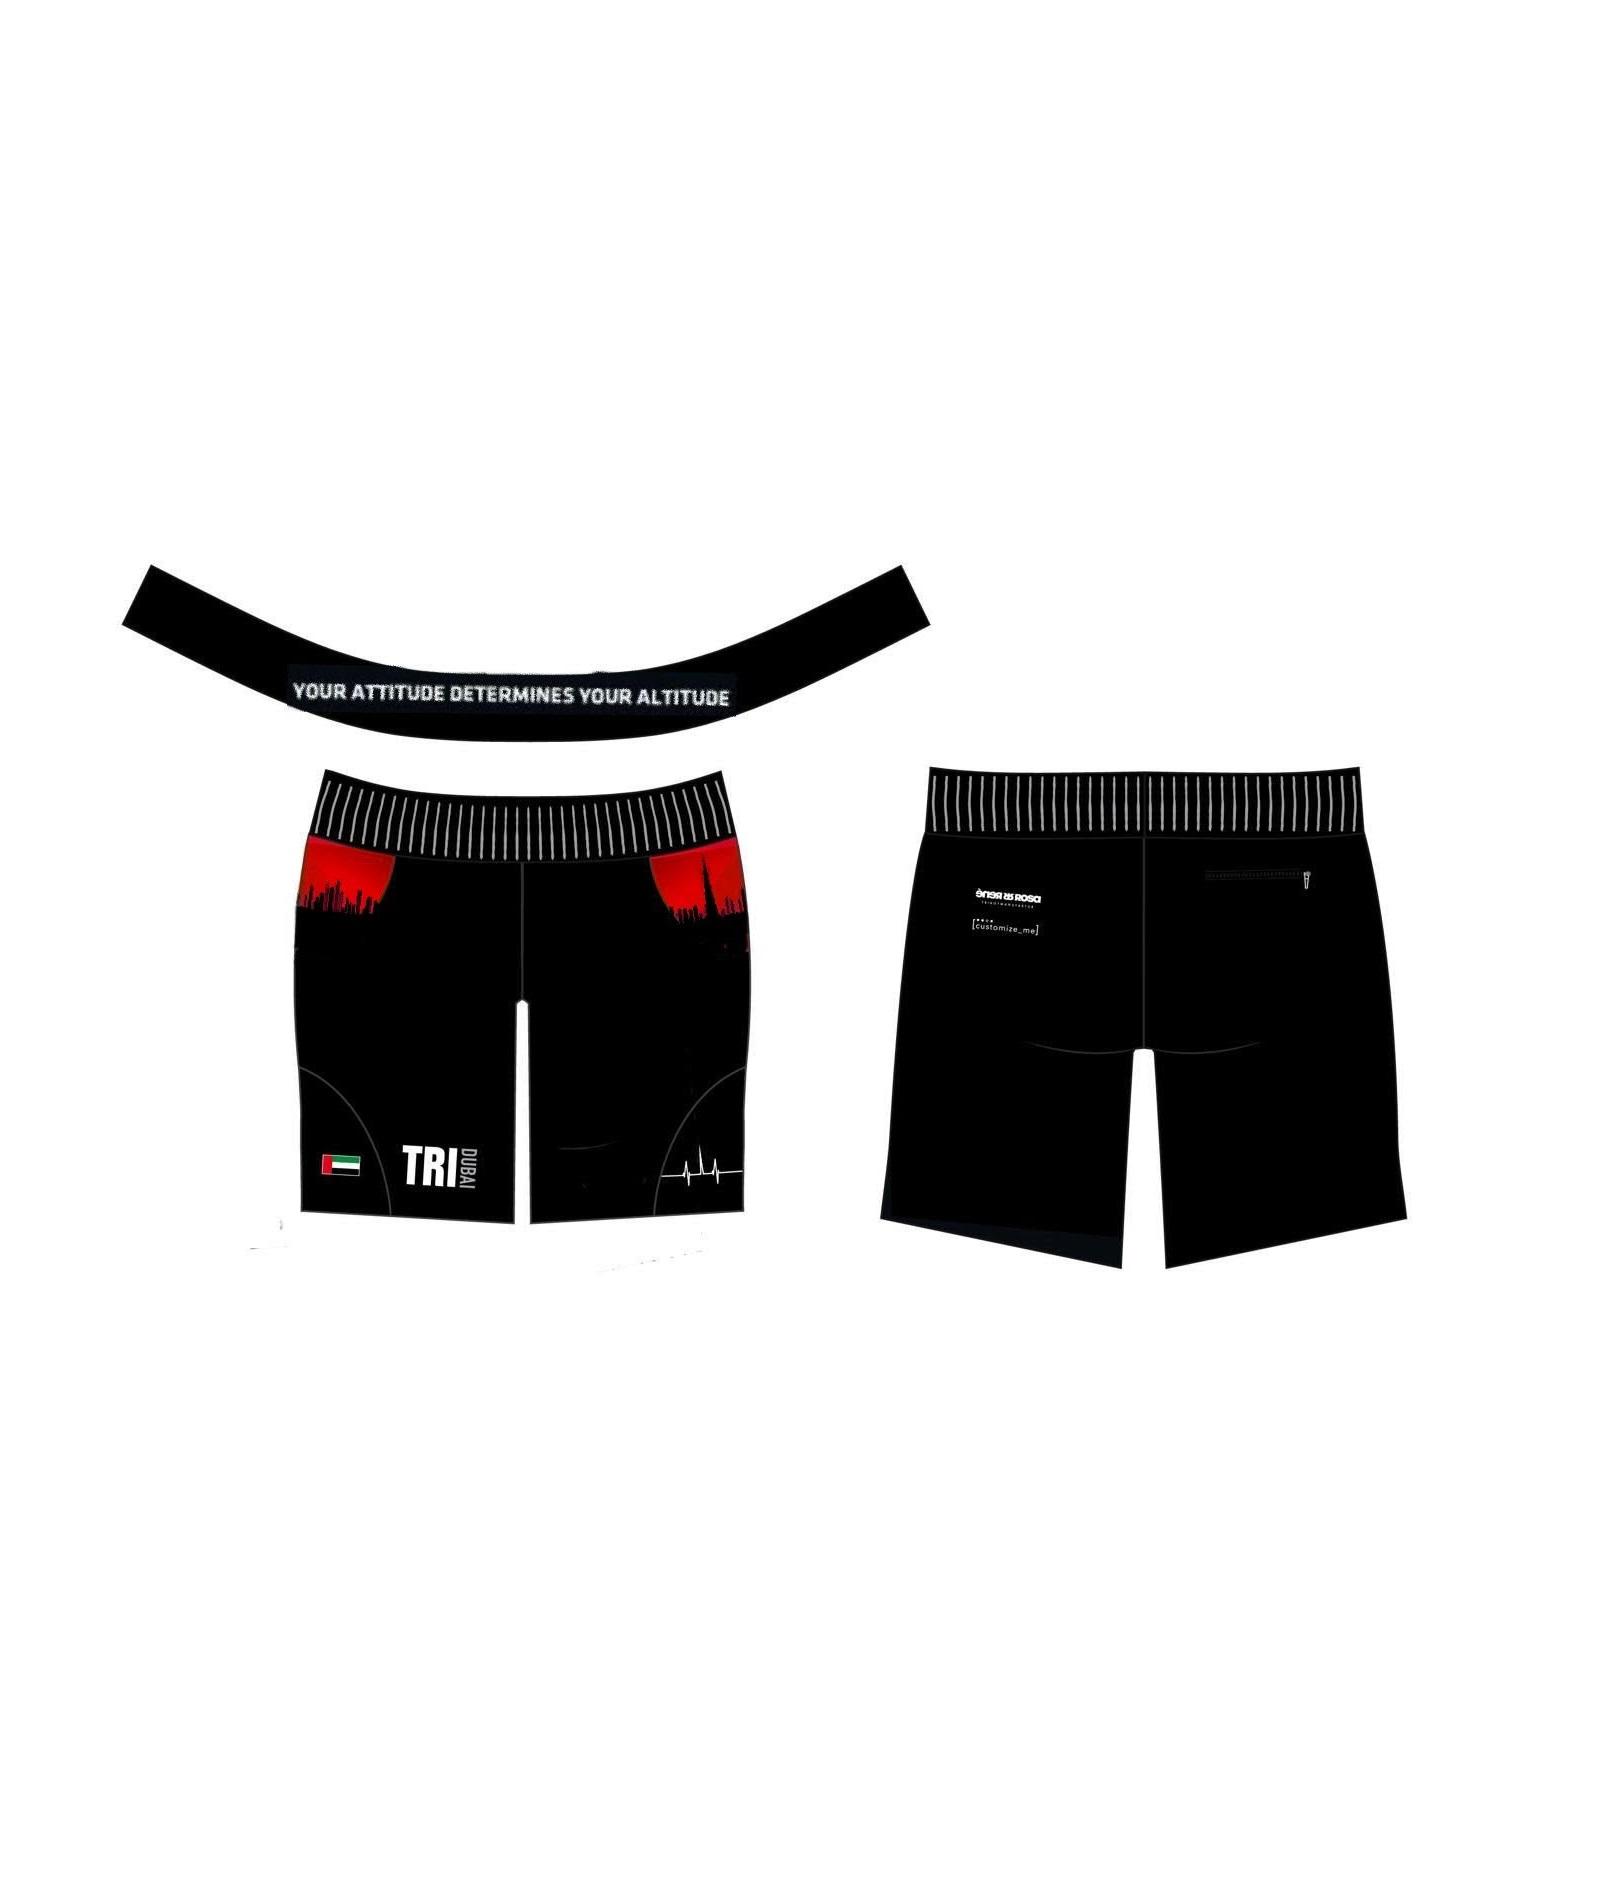 Sported-TriDubai-custom-shorts